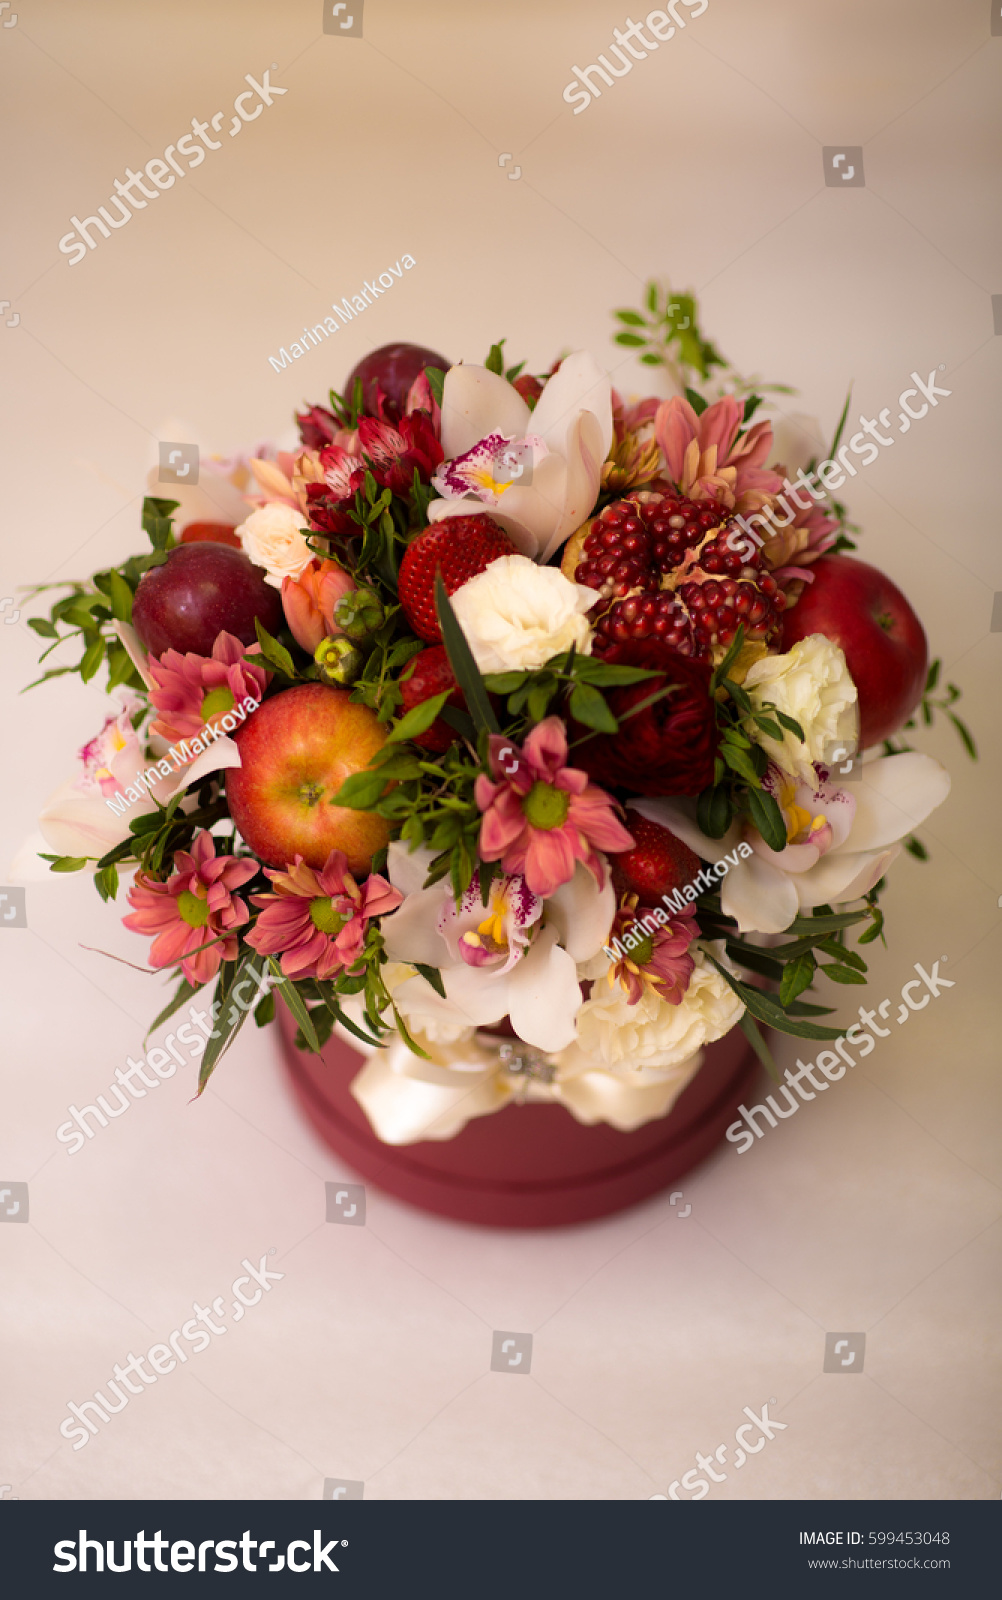 Apple Strawberry Pomegranate Flowers Bouquet Stock Photo Edit Now 599453048